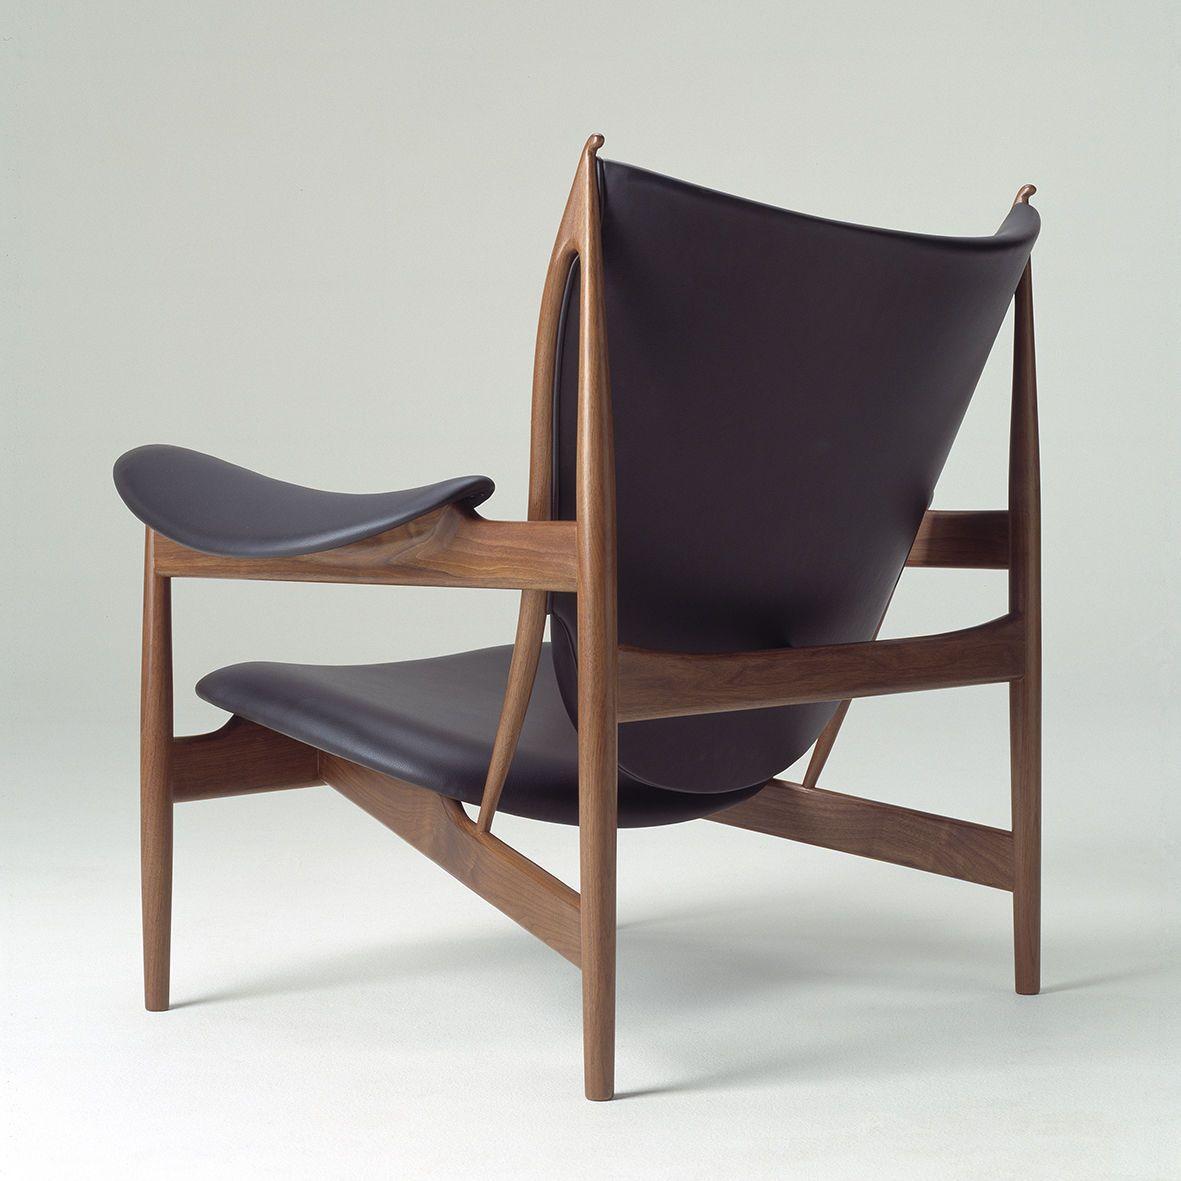 Source Vetustanova Scandinavian Chairs Chair Chaise Chair